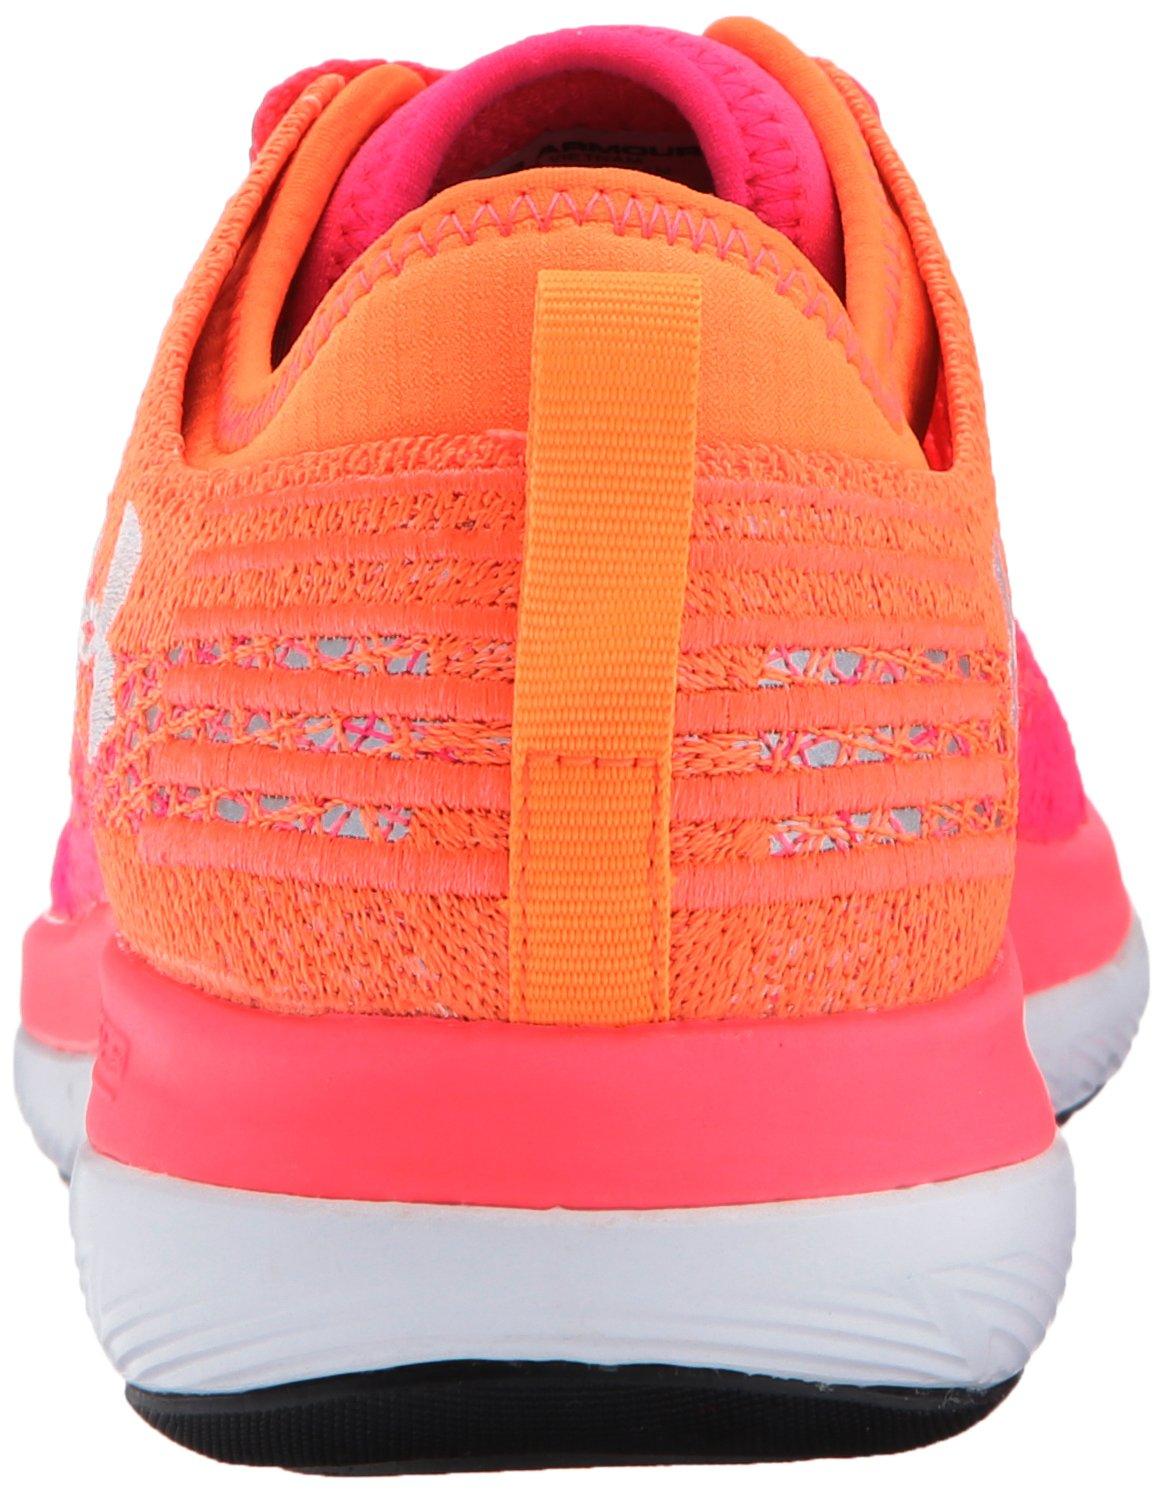 Under M Armour Women's Threadborne Fortis Running Shoe B01N2T89WT 5.5 M Under US|Penta Pink (600)/Magma Orange e1314f